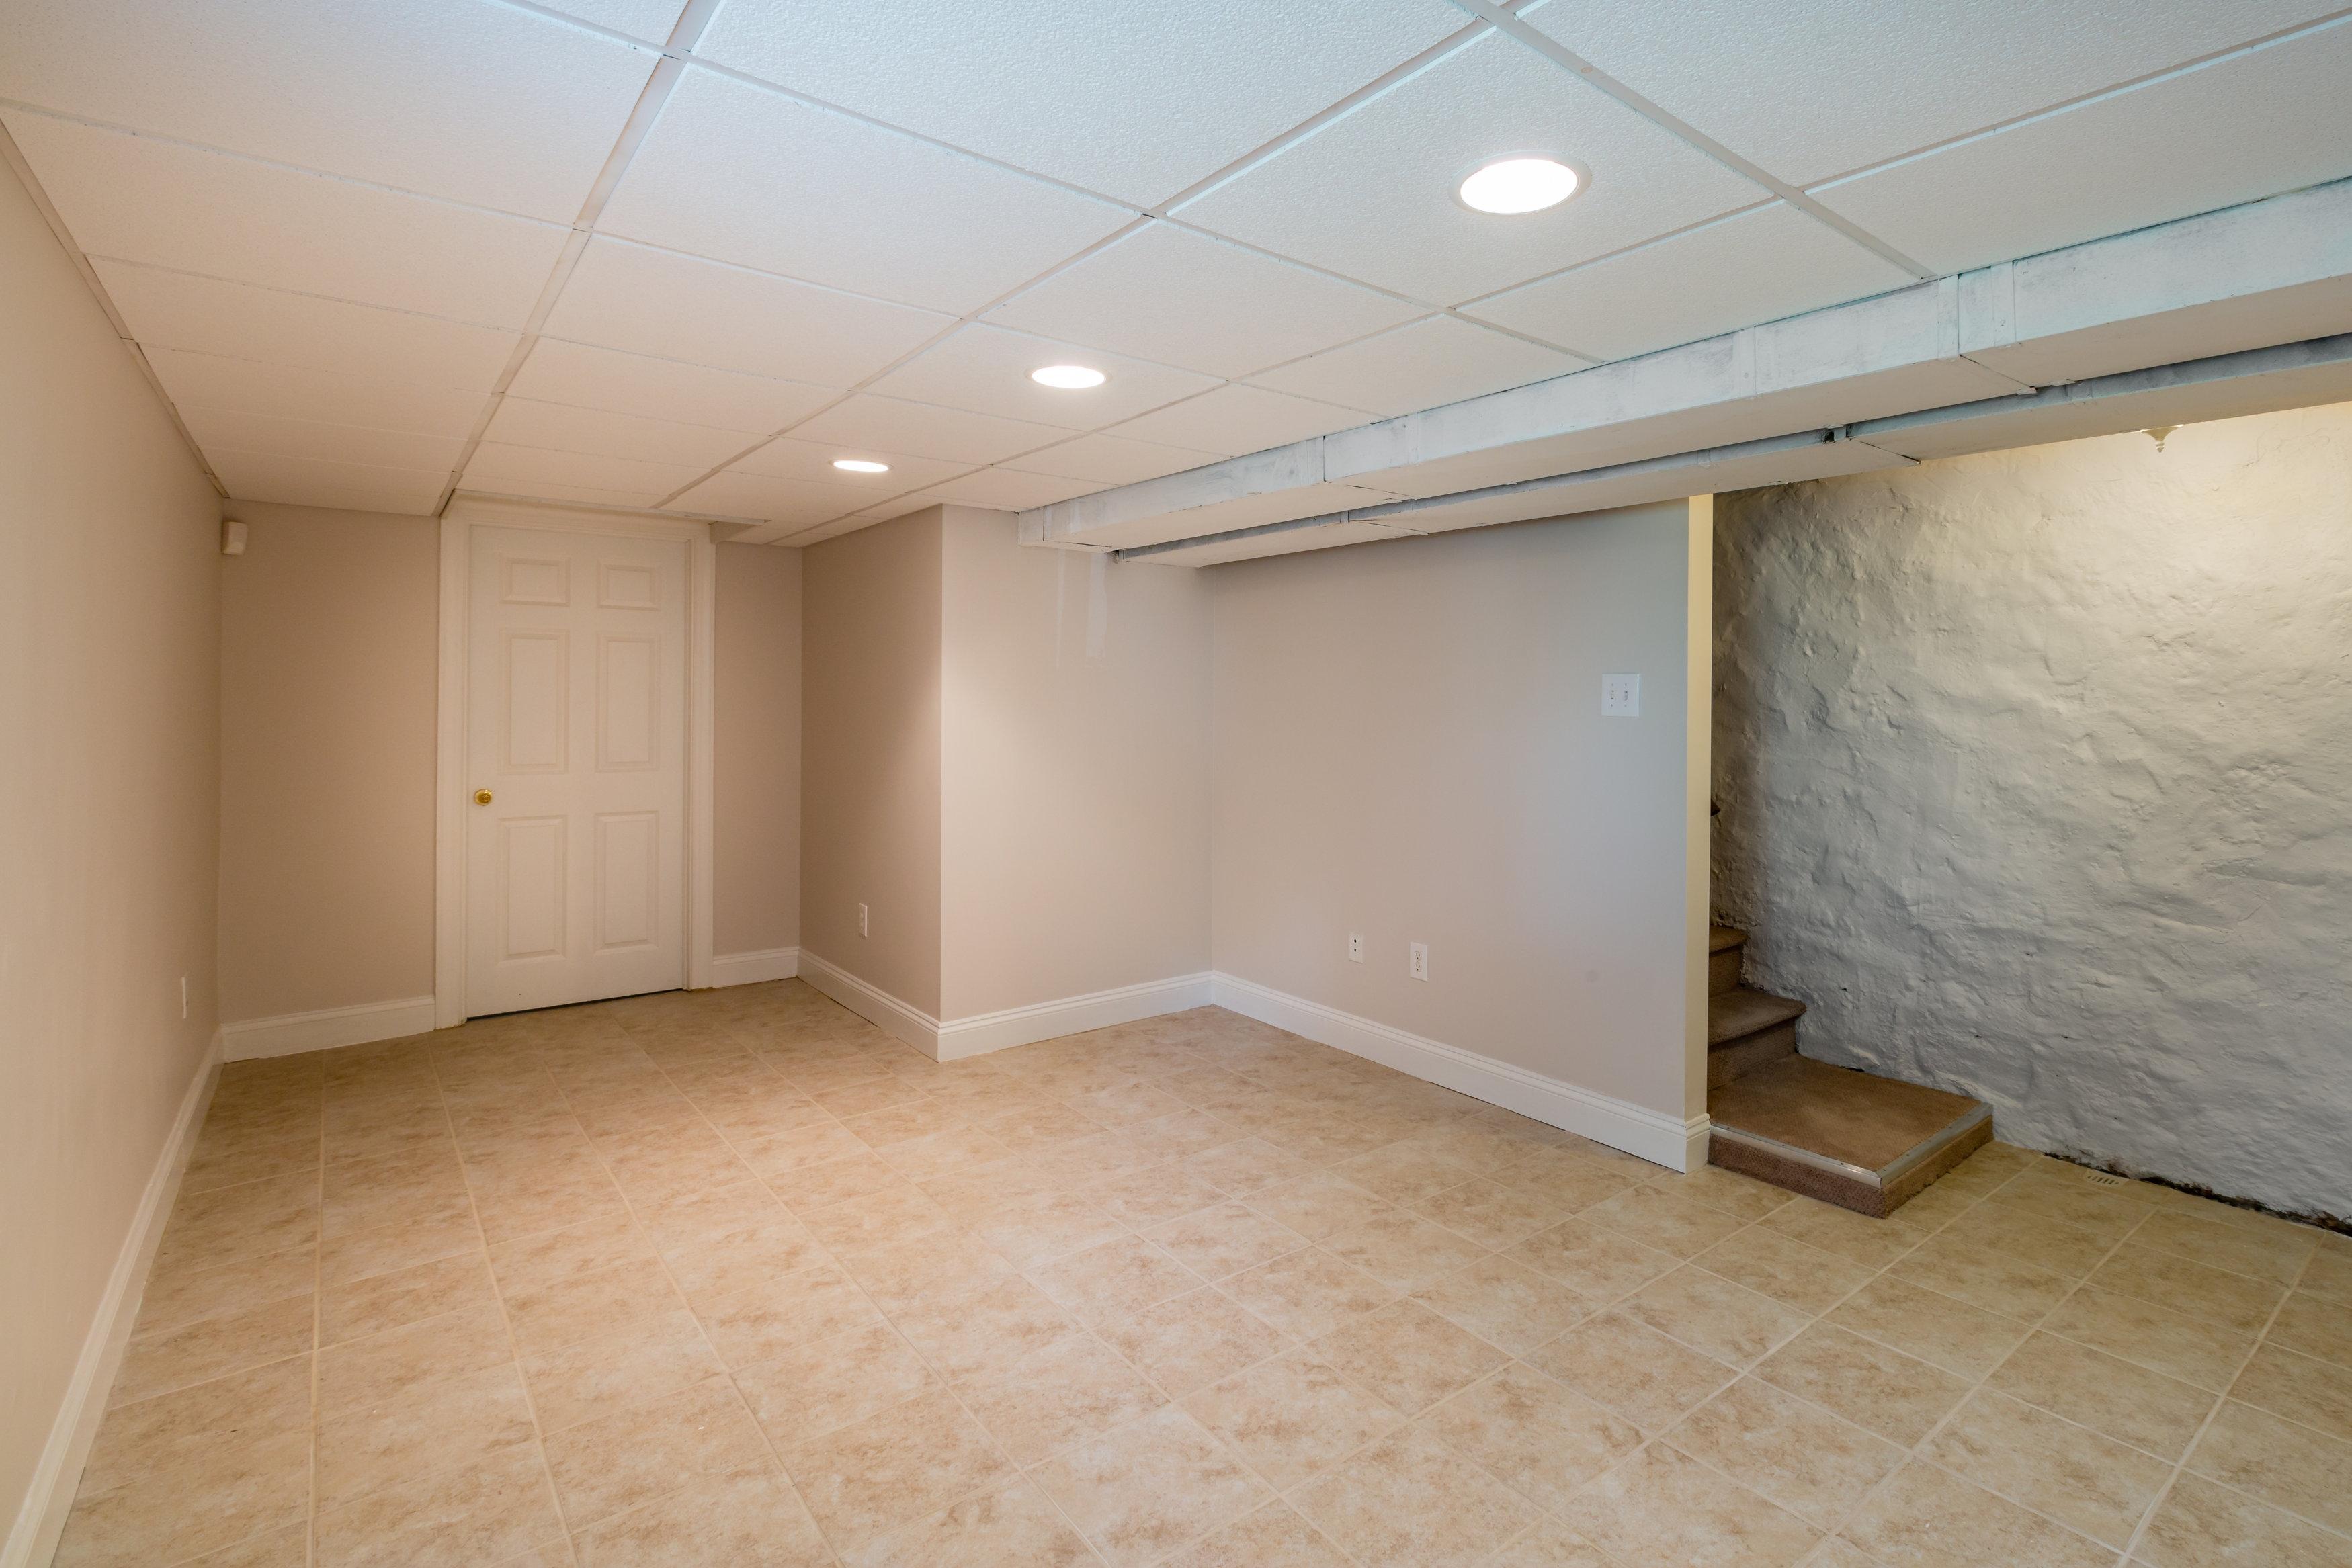 Basement Ceiling Tiles